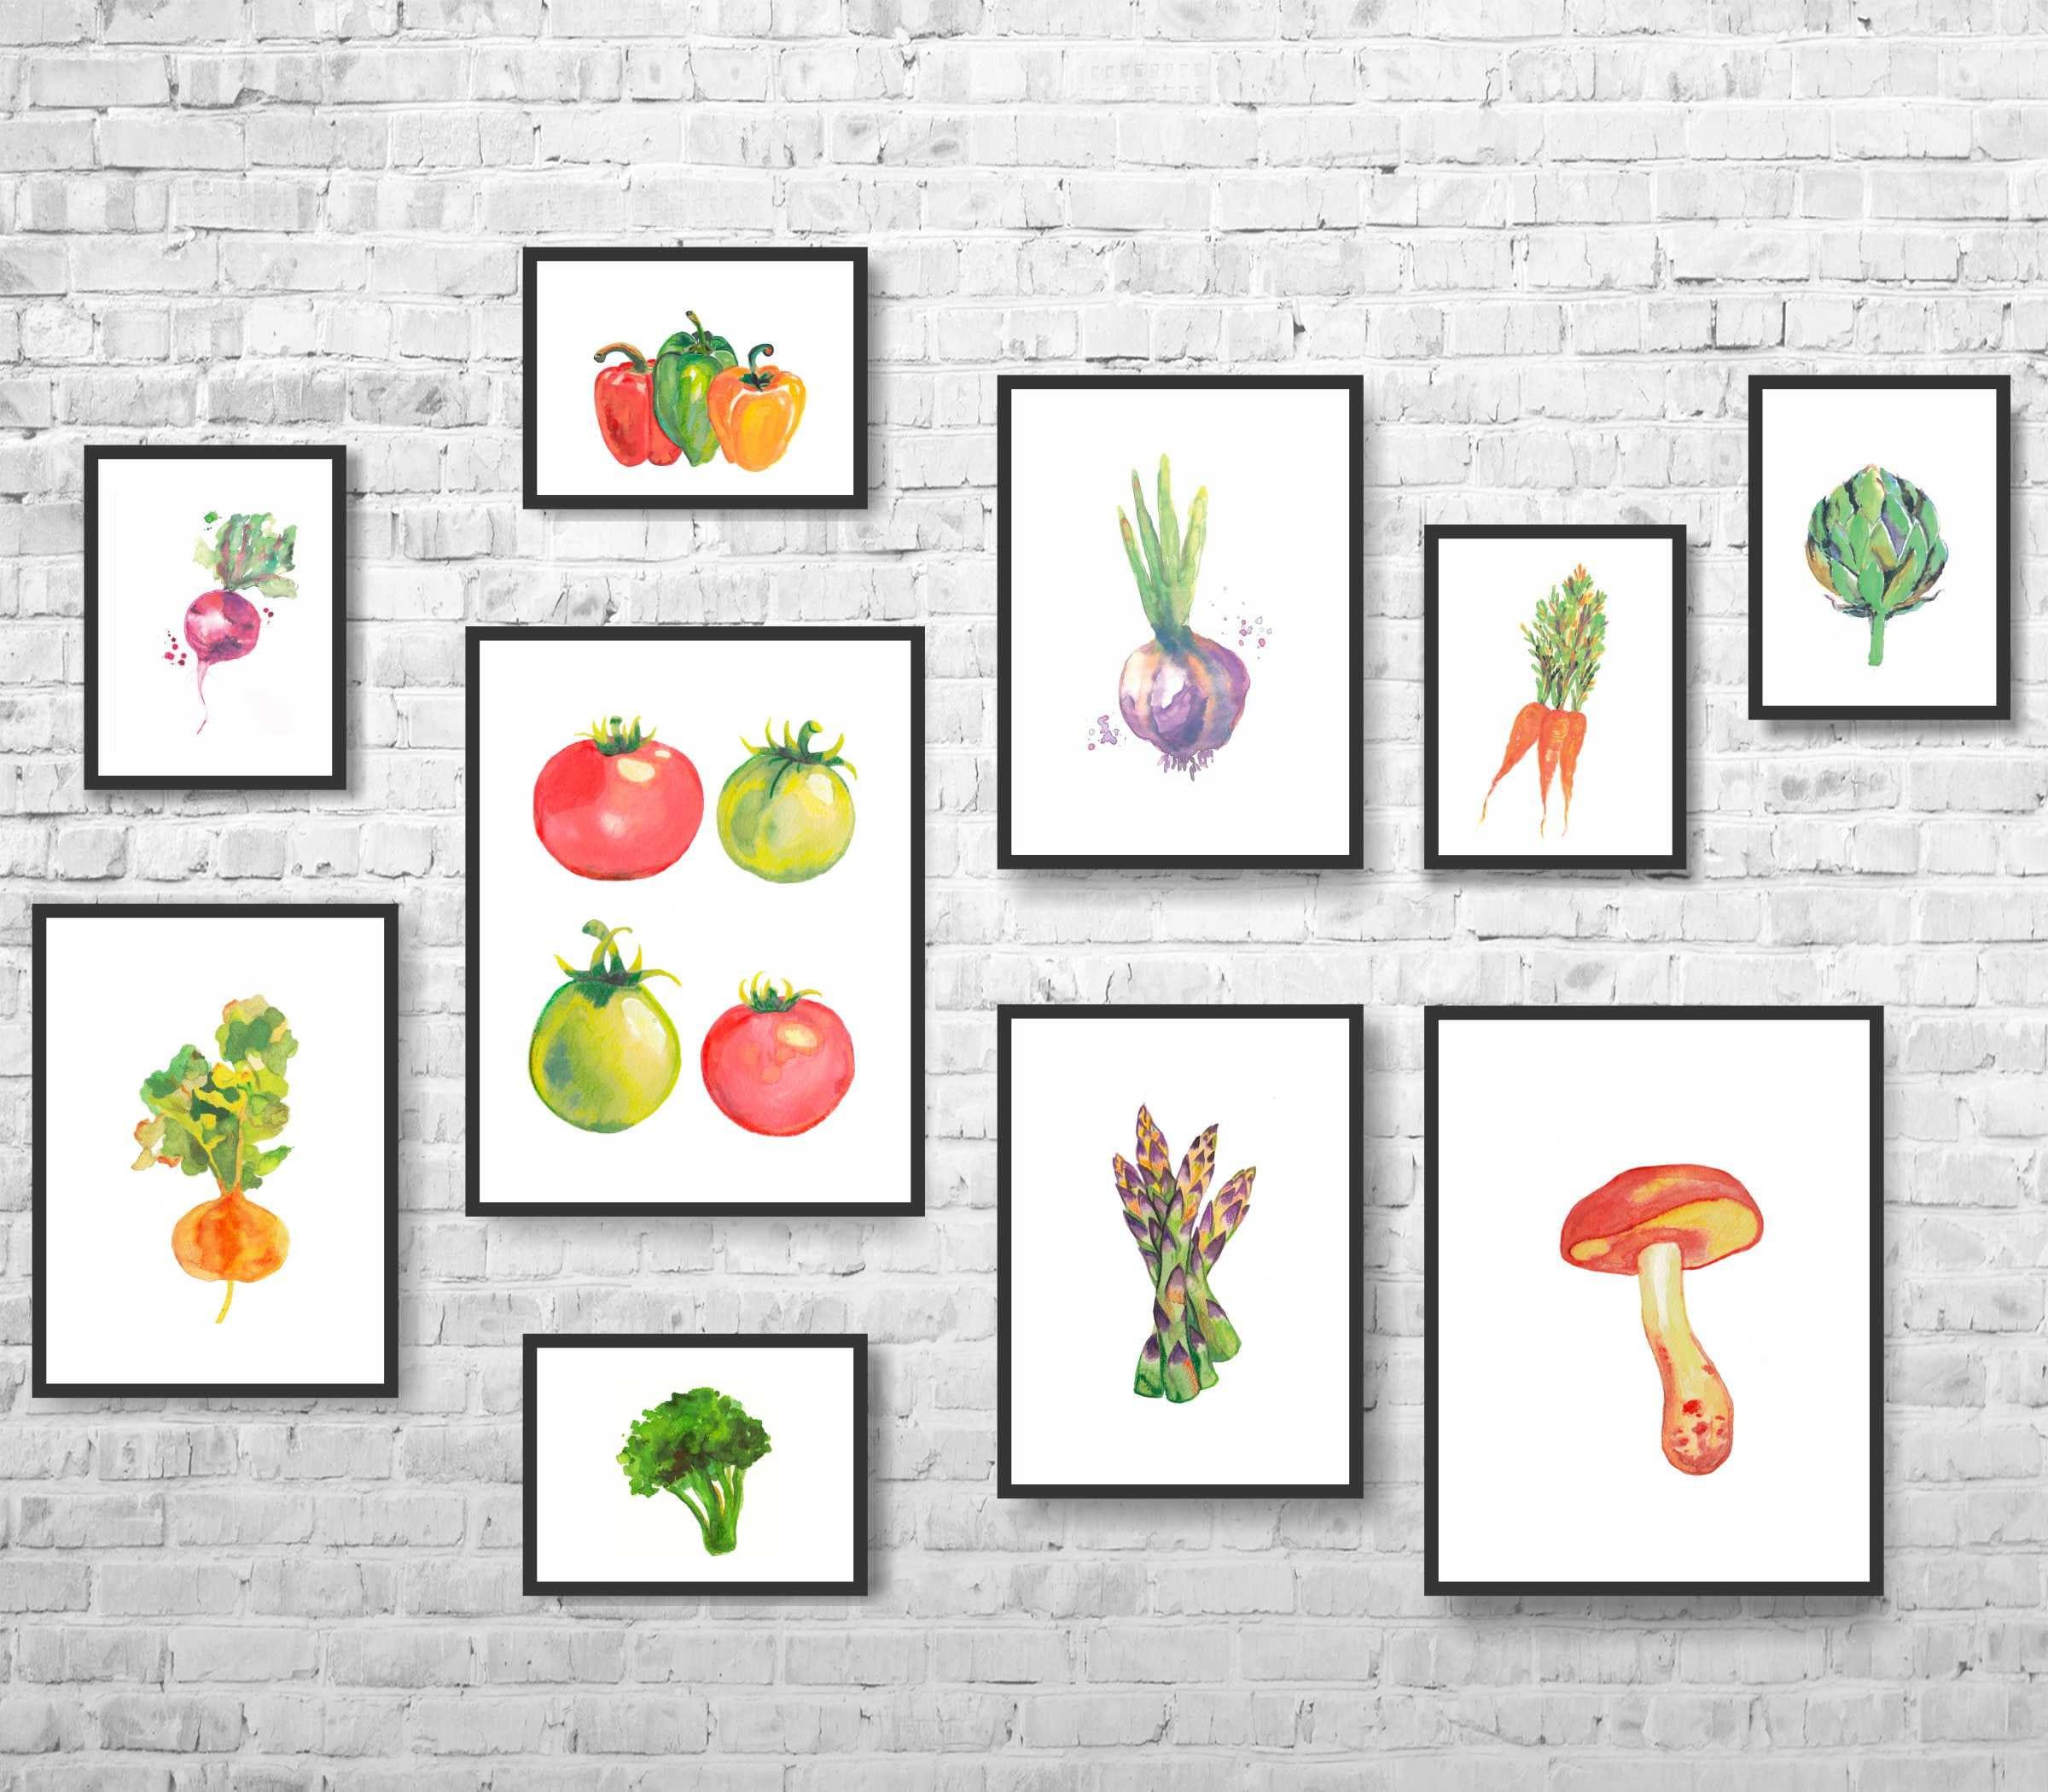 Kitchen Decor Vegetables: Kitchen Decor-Vegetables Decor-Vegetables Print-Vegetables